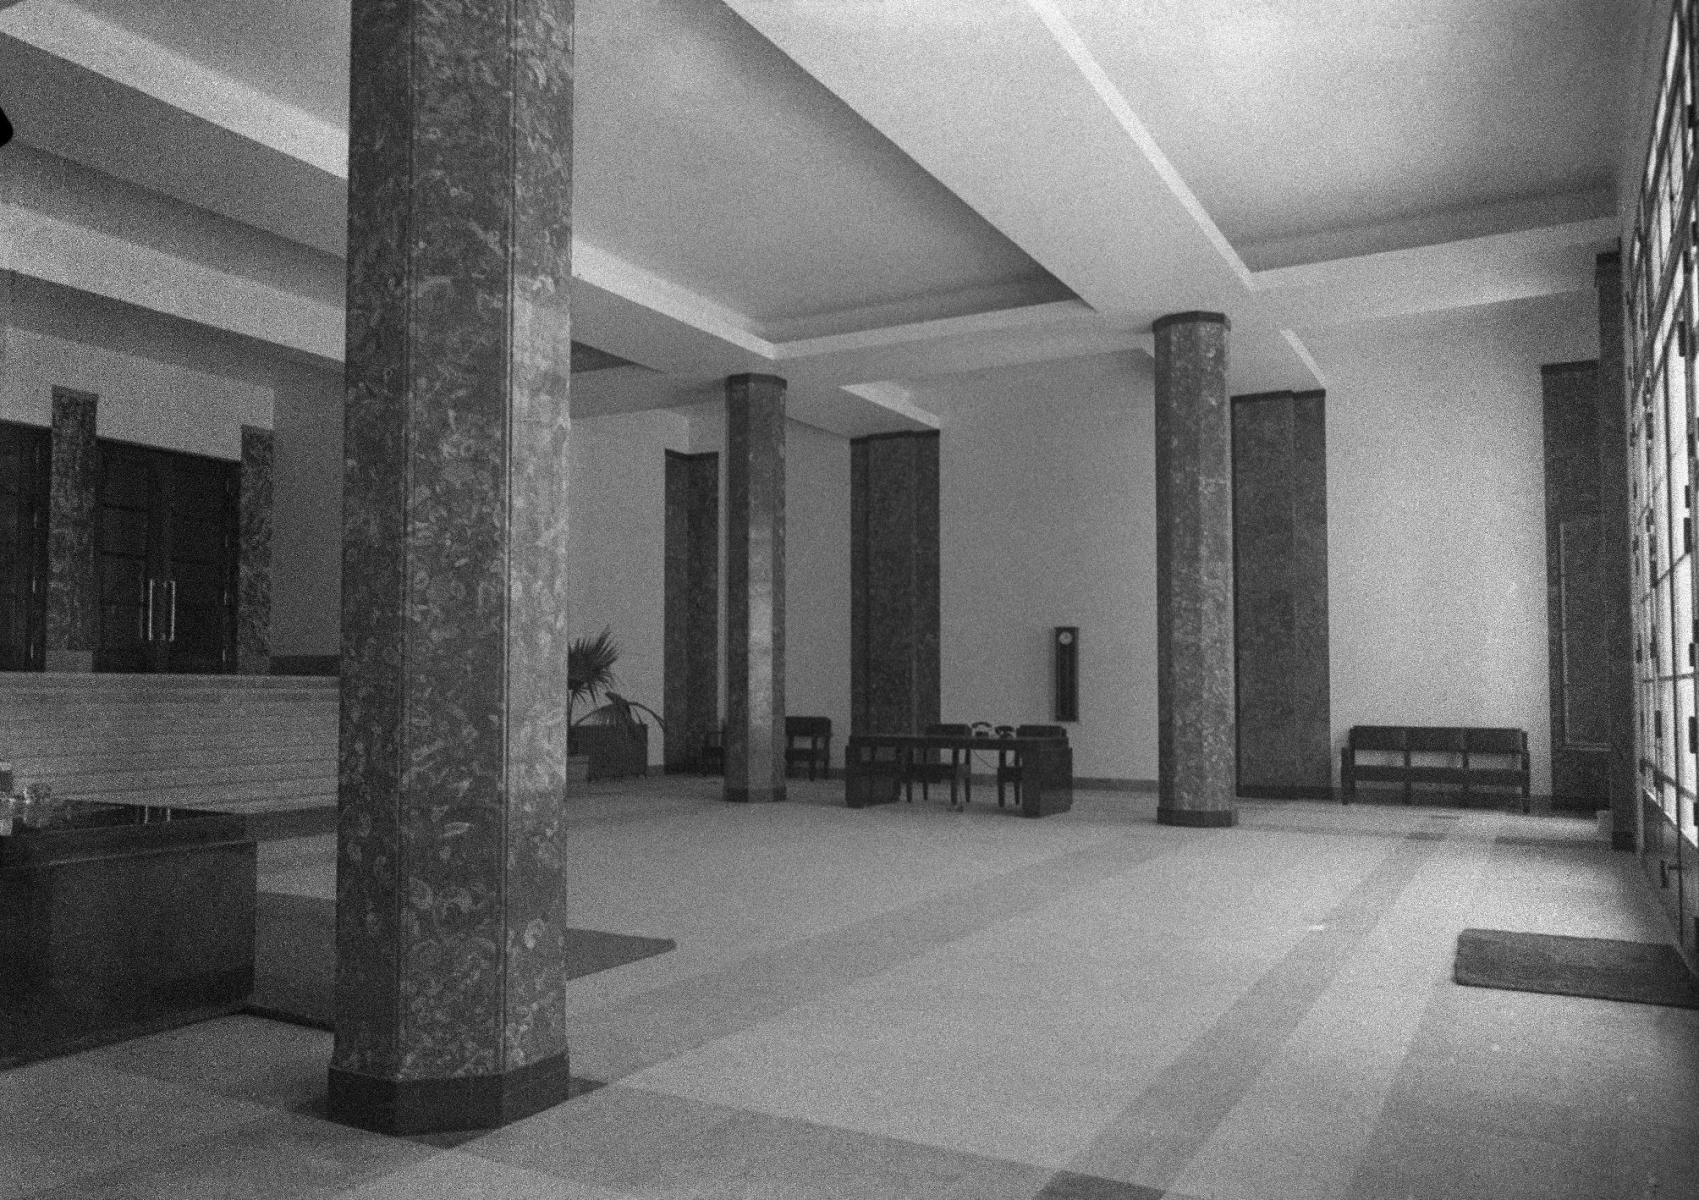 Interiores do edifício